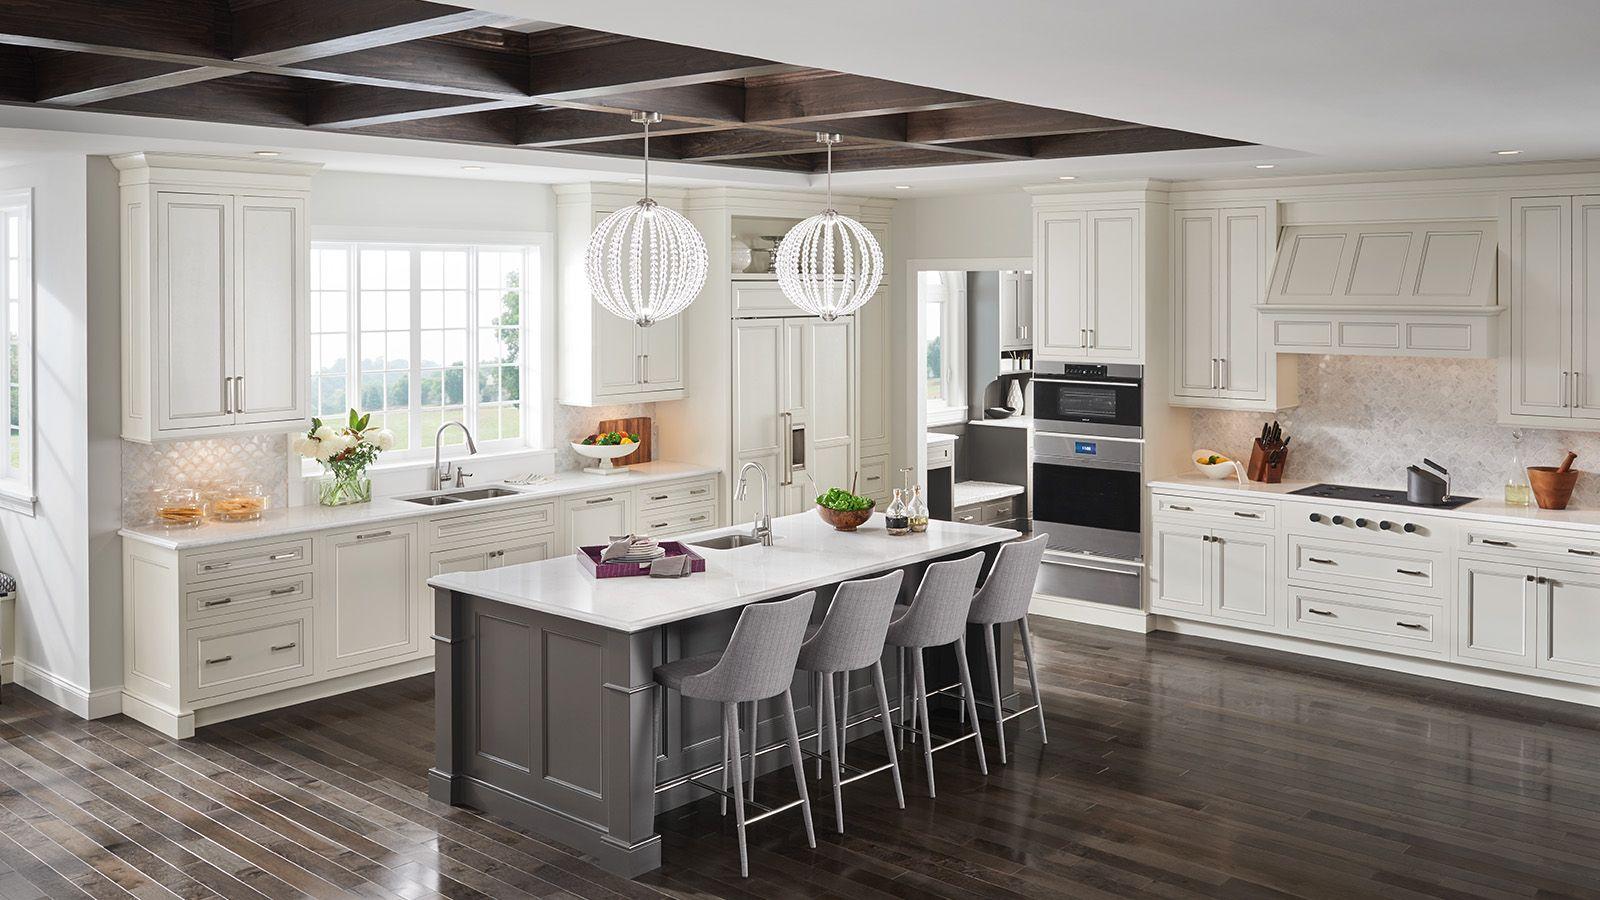 Visualizer Onyx Marble Granite Quartz Countertops Countertops Transitional Kitchen